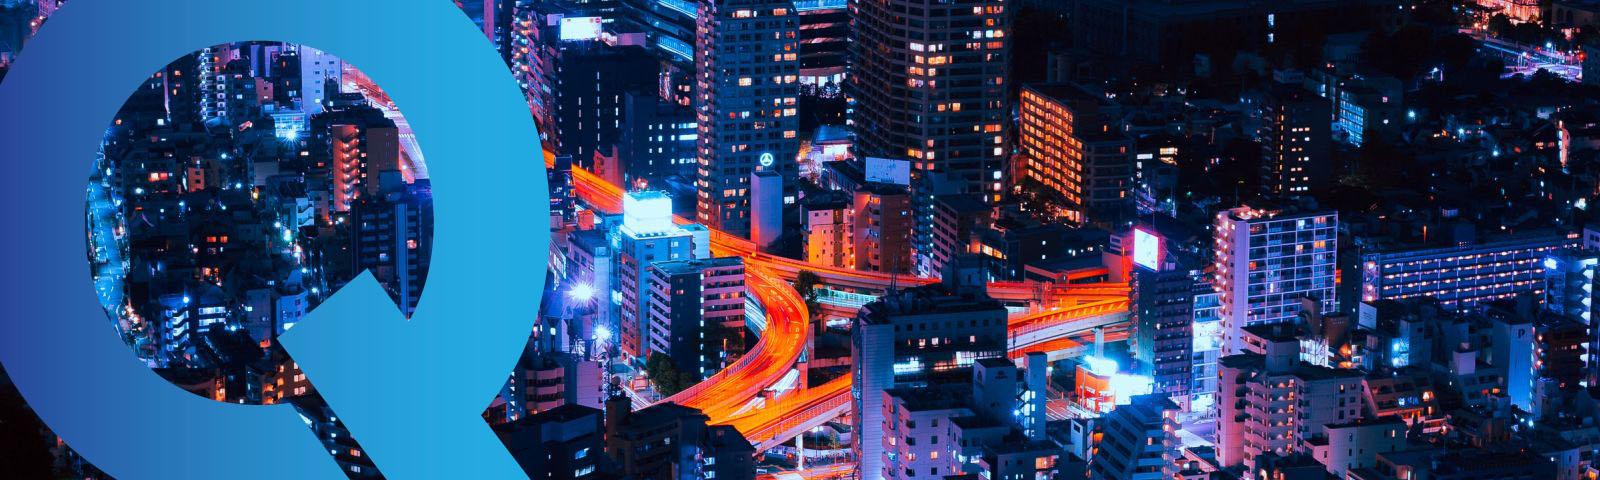 QULON CMS - Smart Street Lighting Management Systems